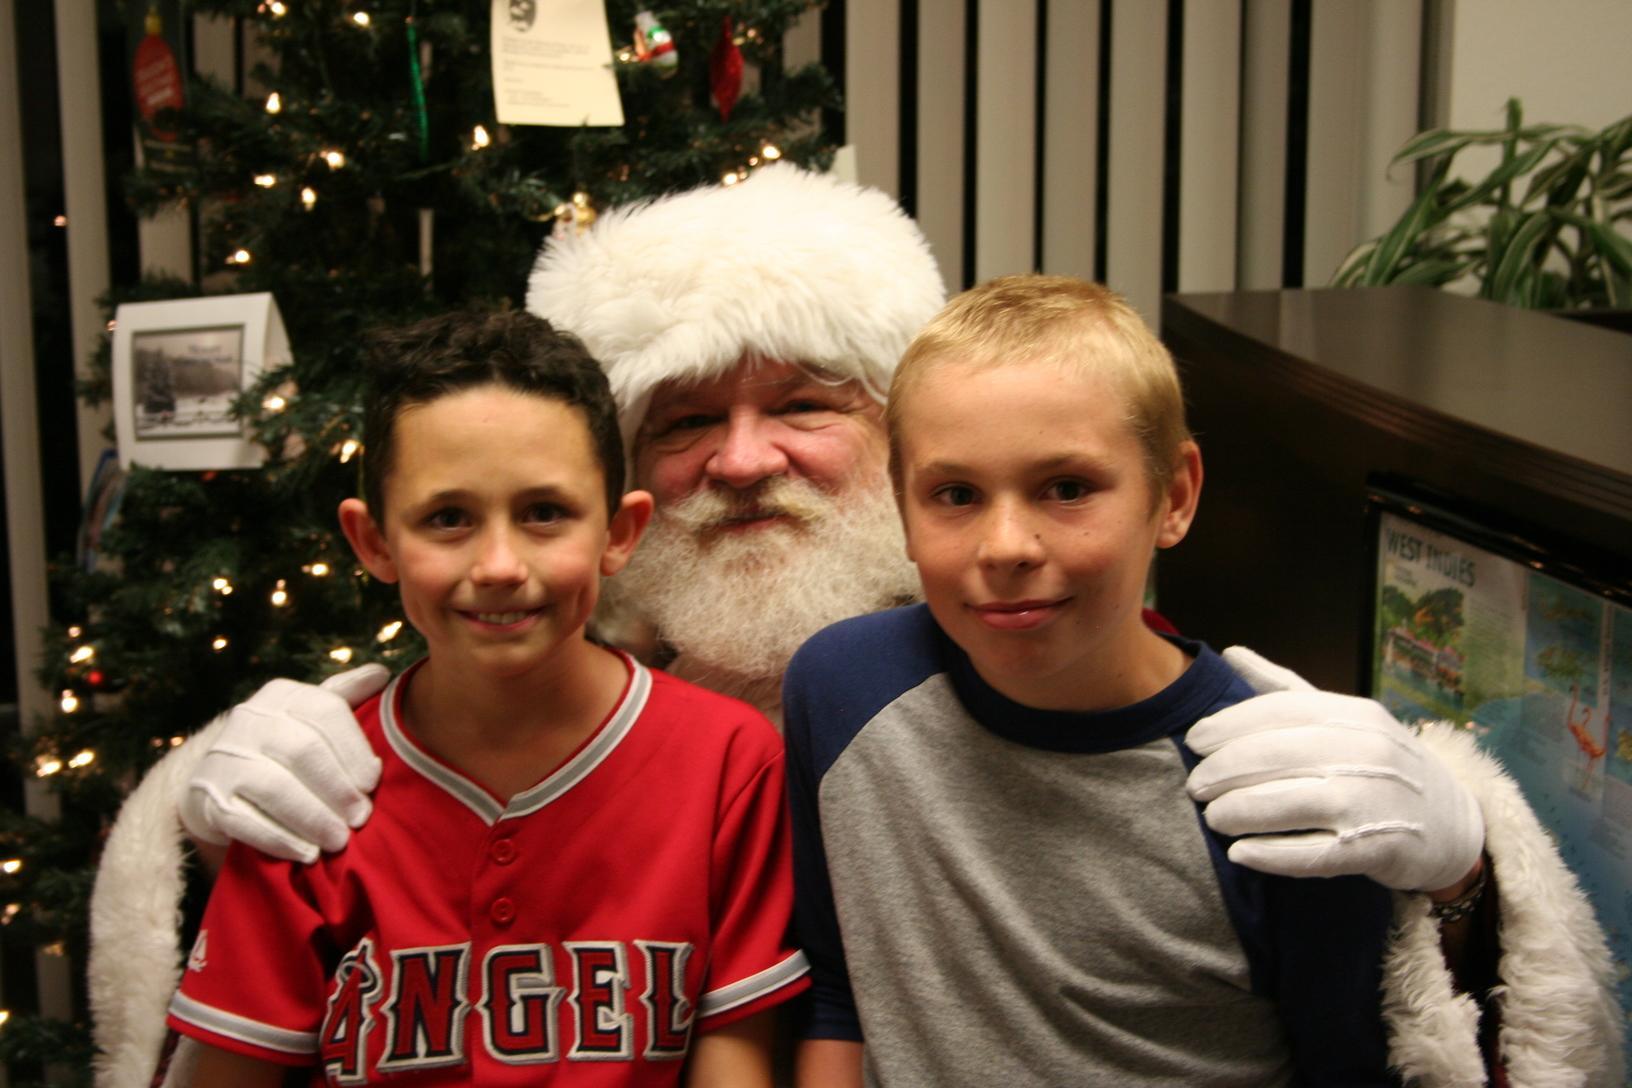 Santa and the boys